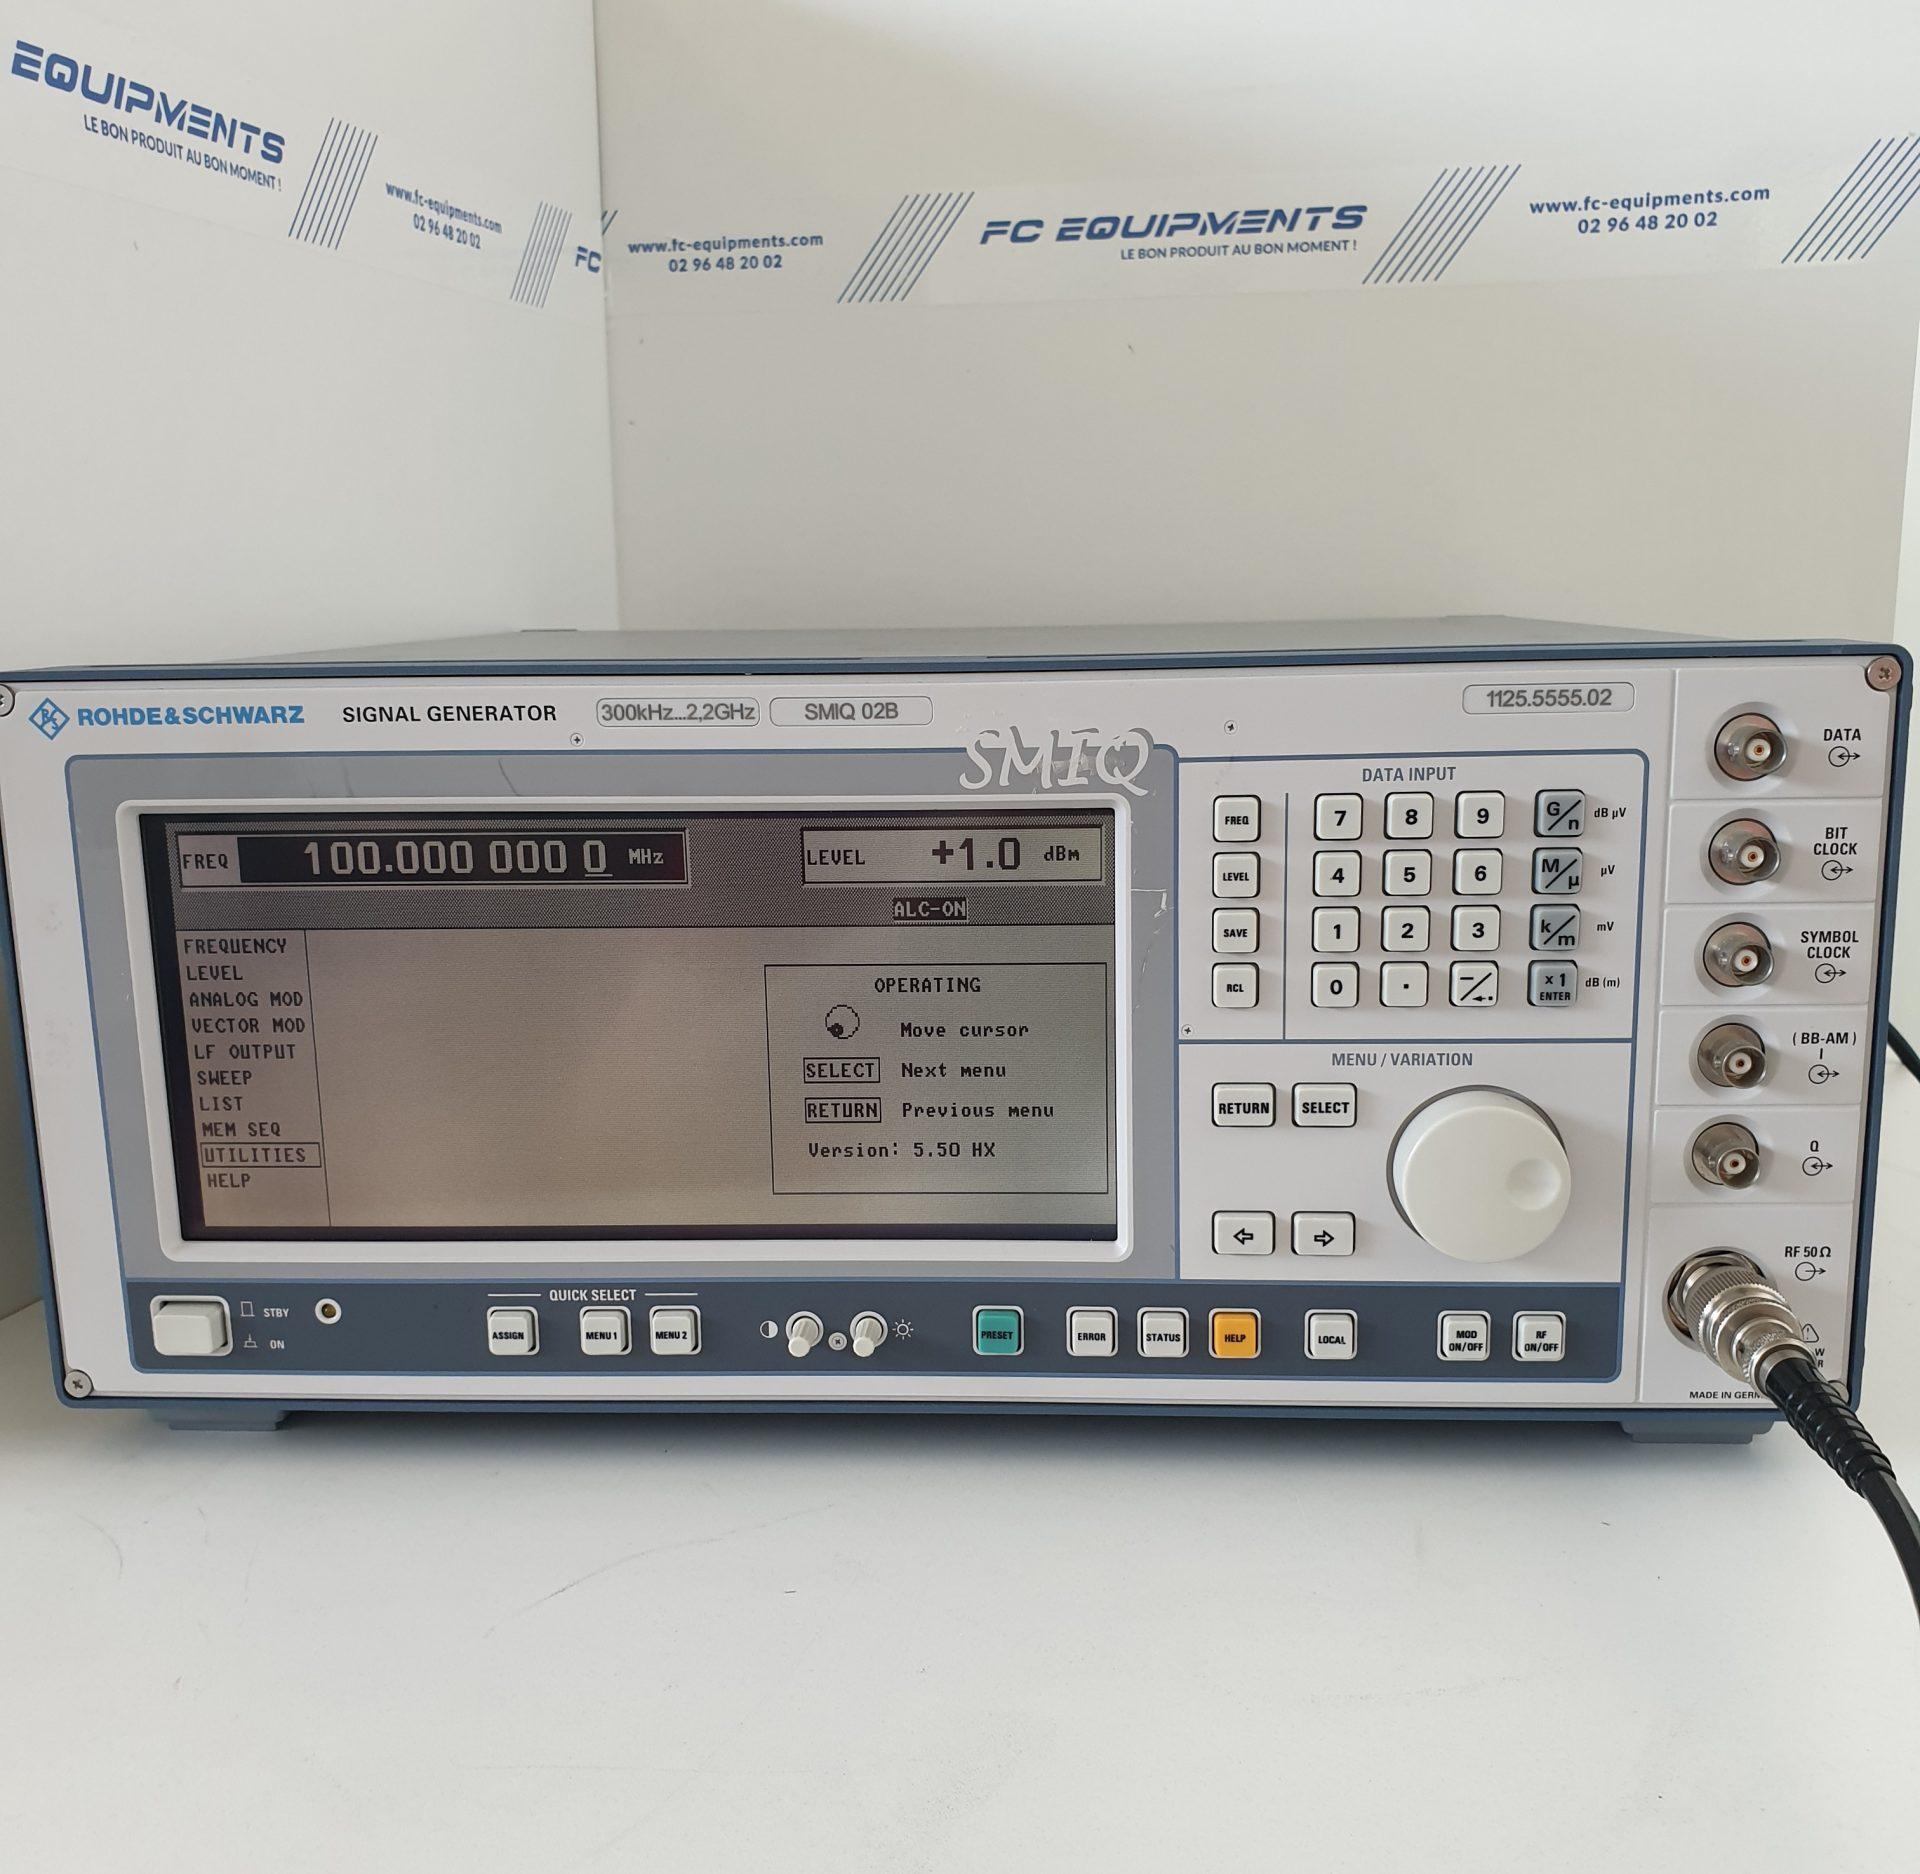 VECTOR SIGNAL GENERATOR 300KHz - 2.2GHz - ROHDE & SCHWARZ